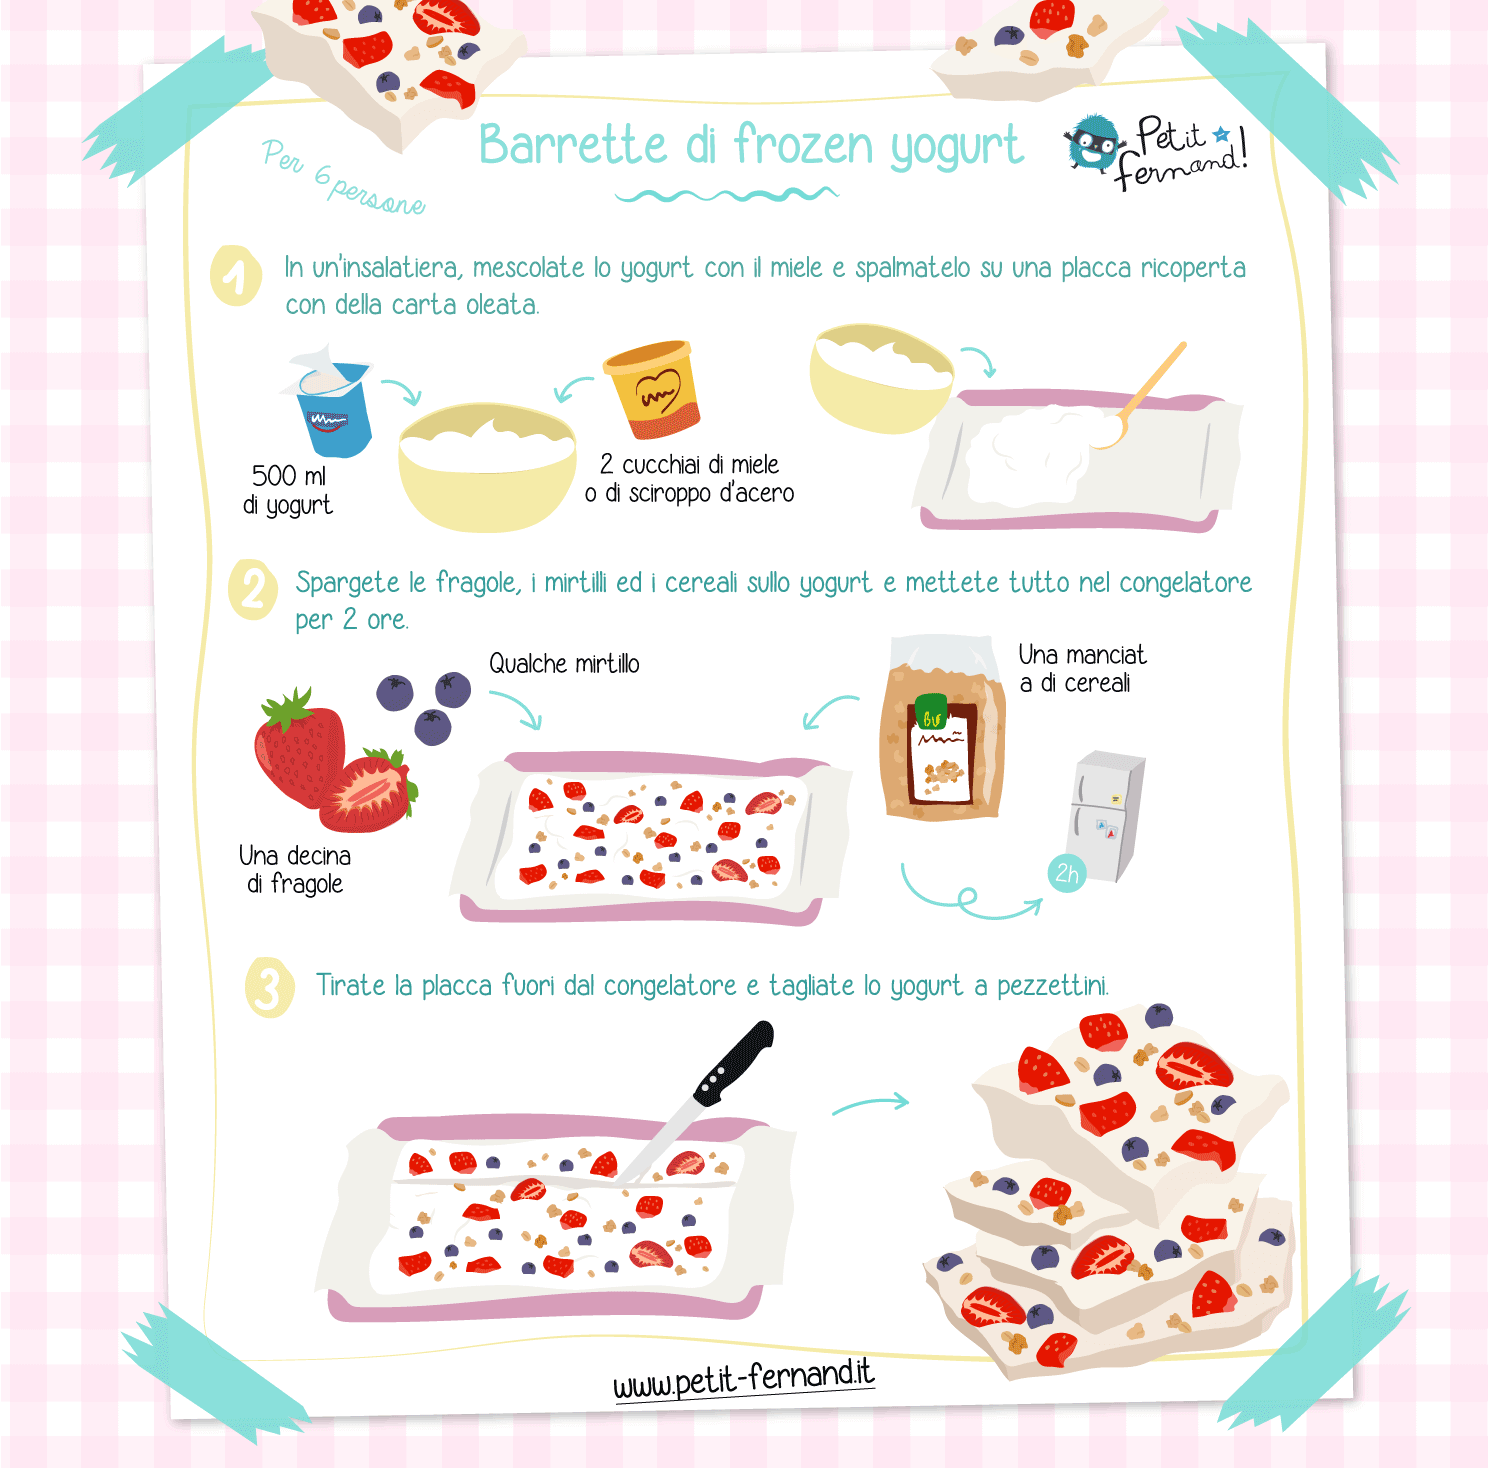 Barrette di Frozen Yogurt